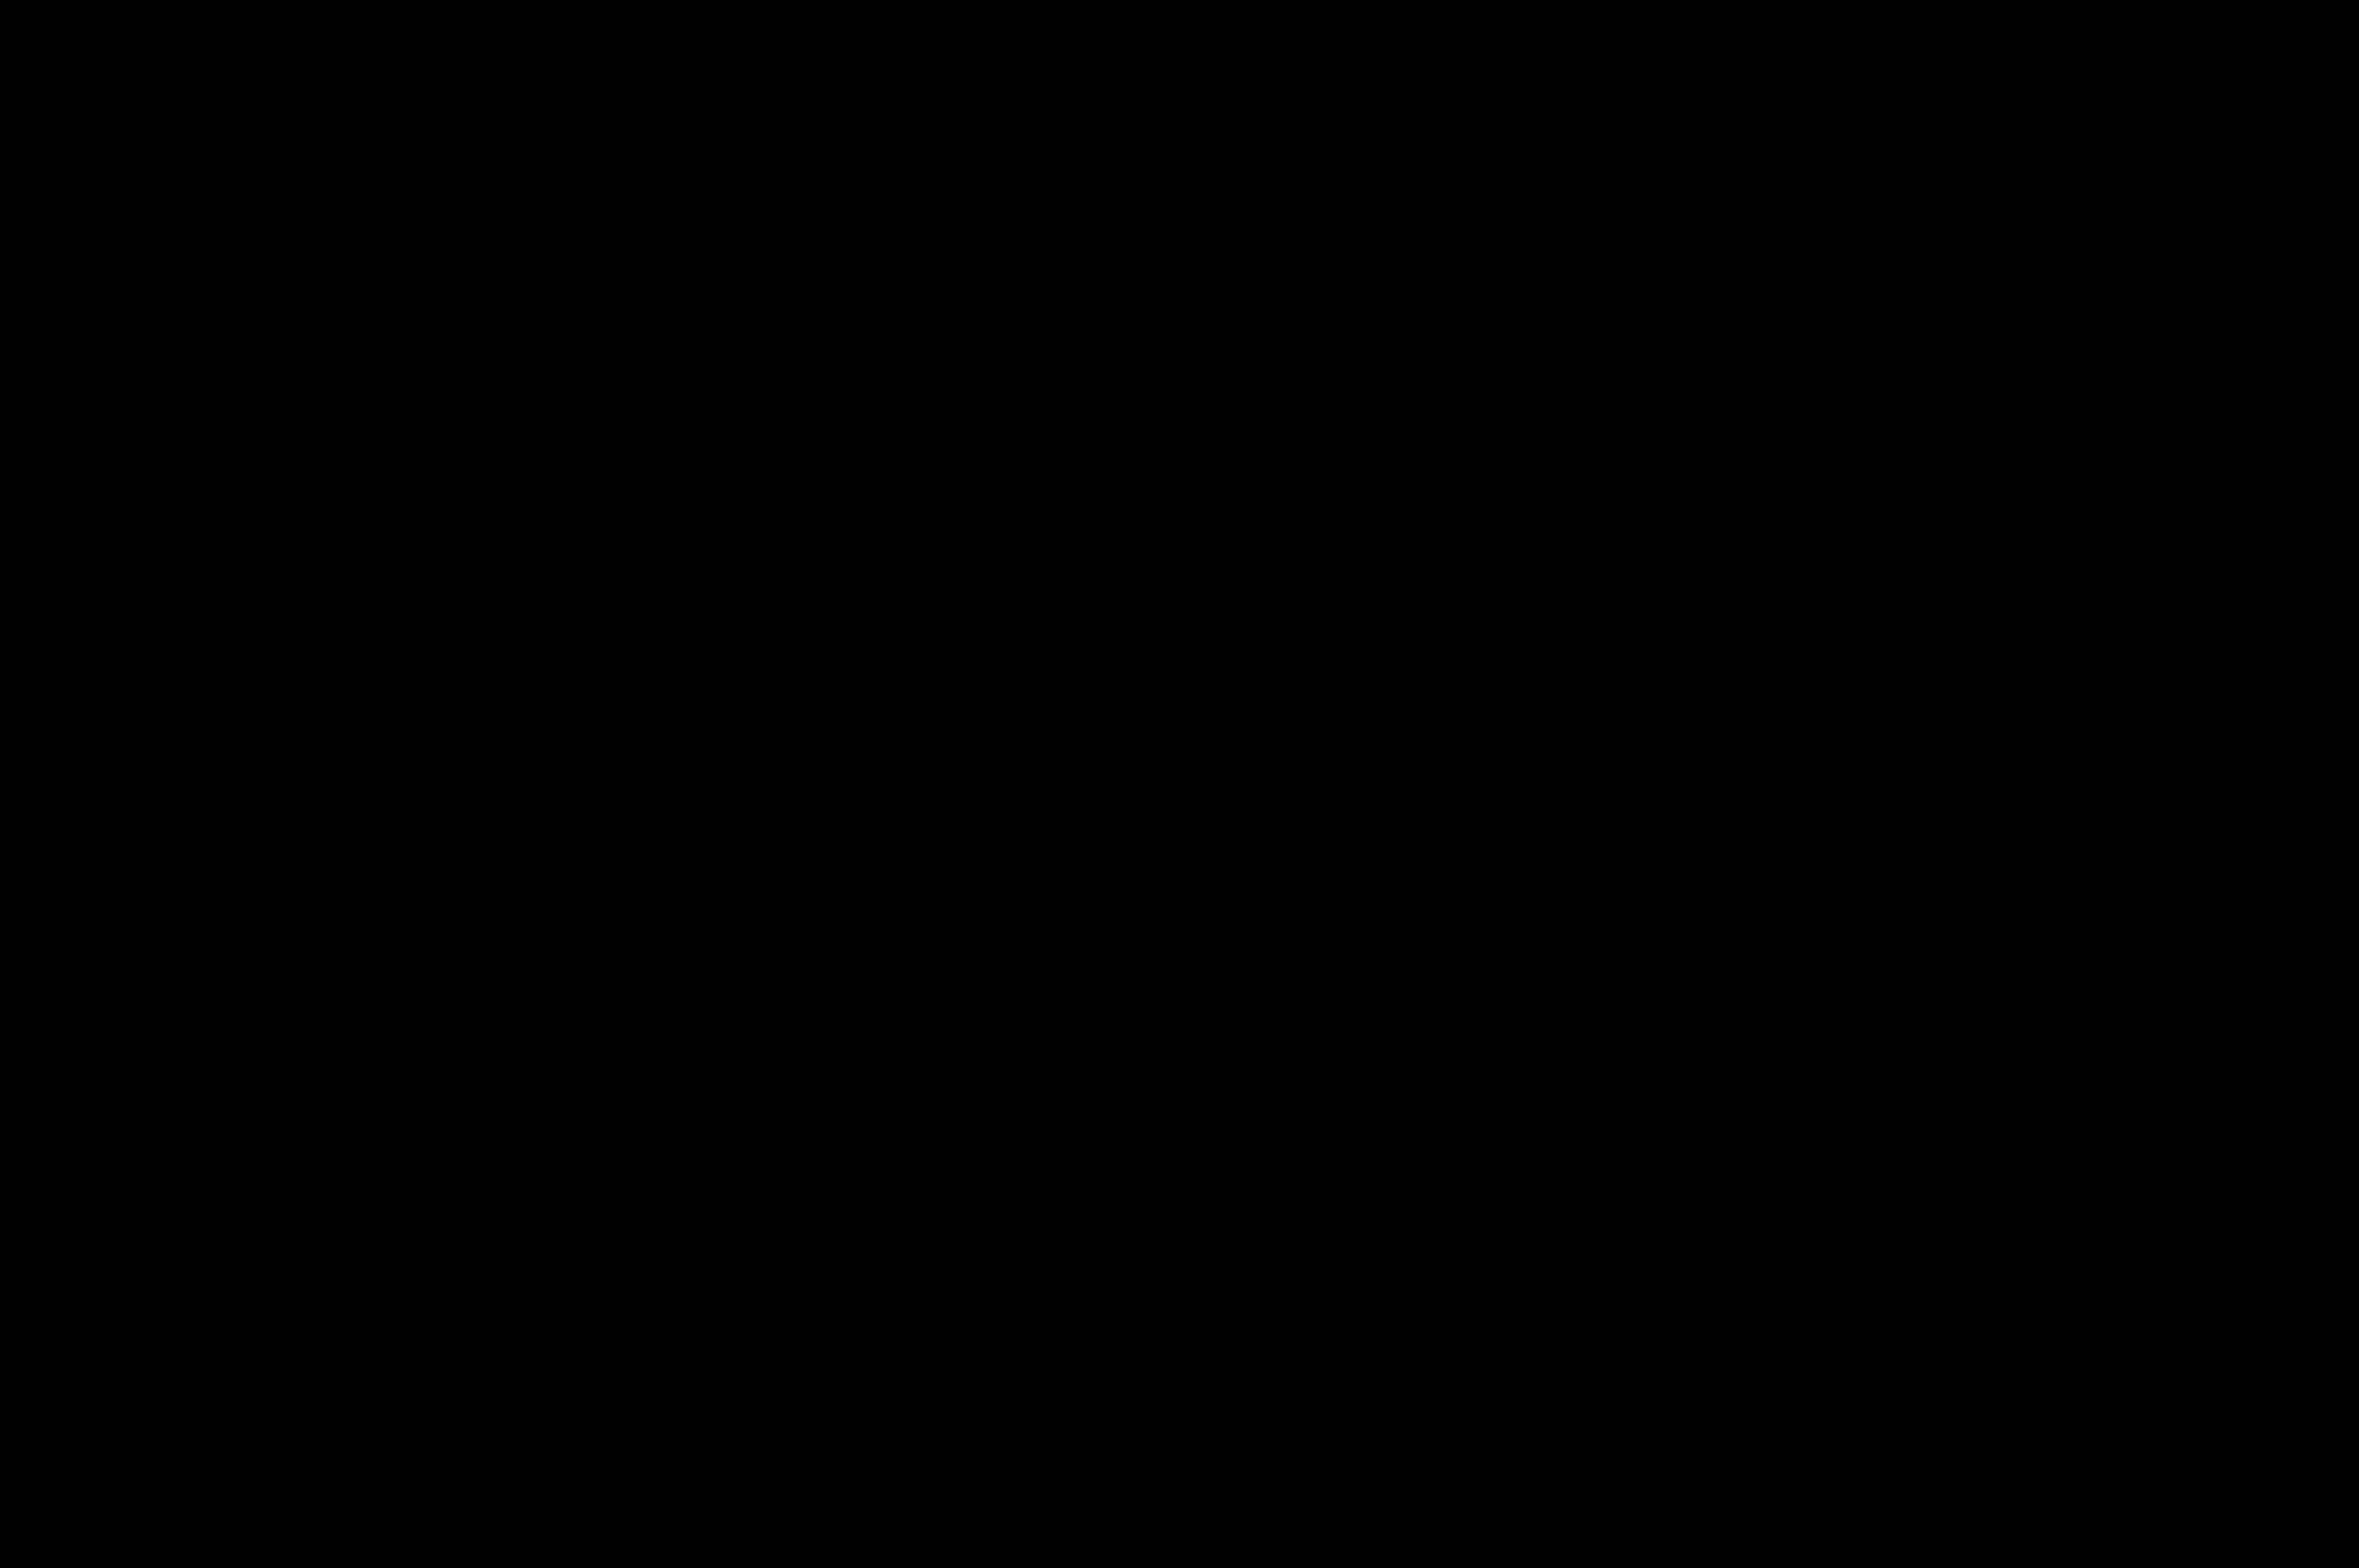 11_18_2008-33